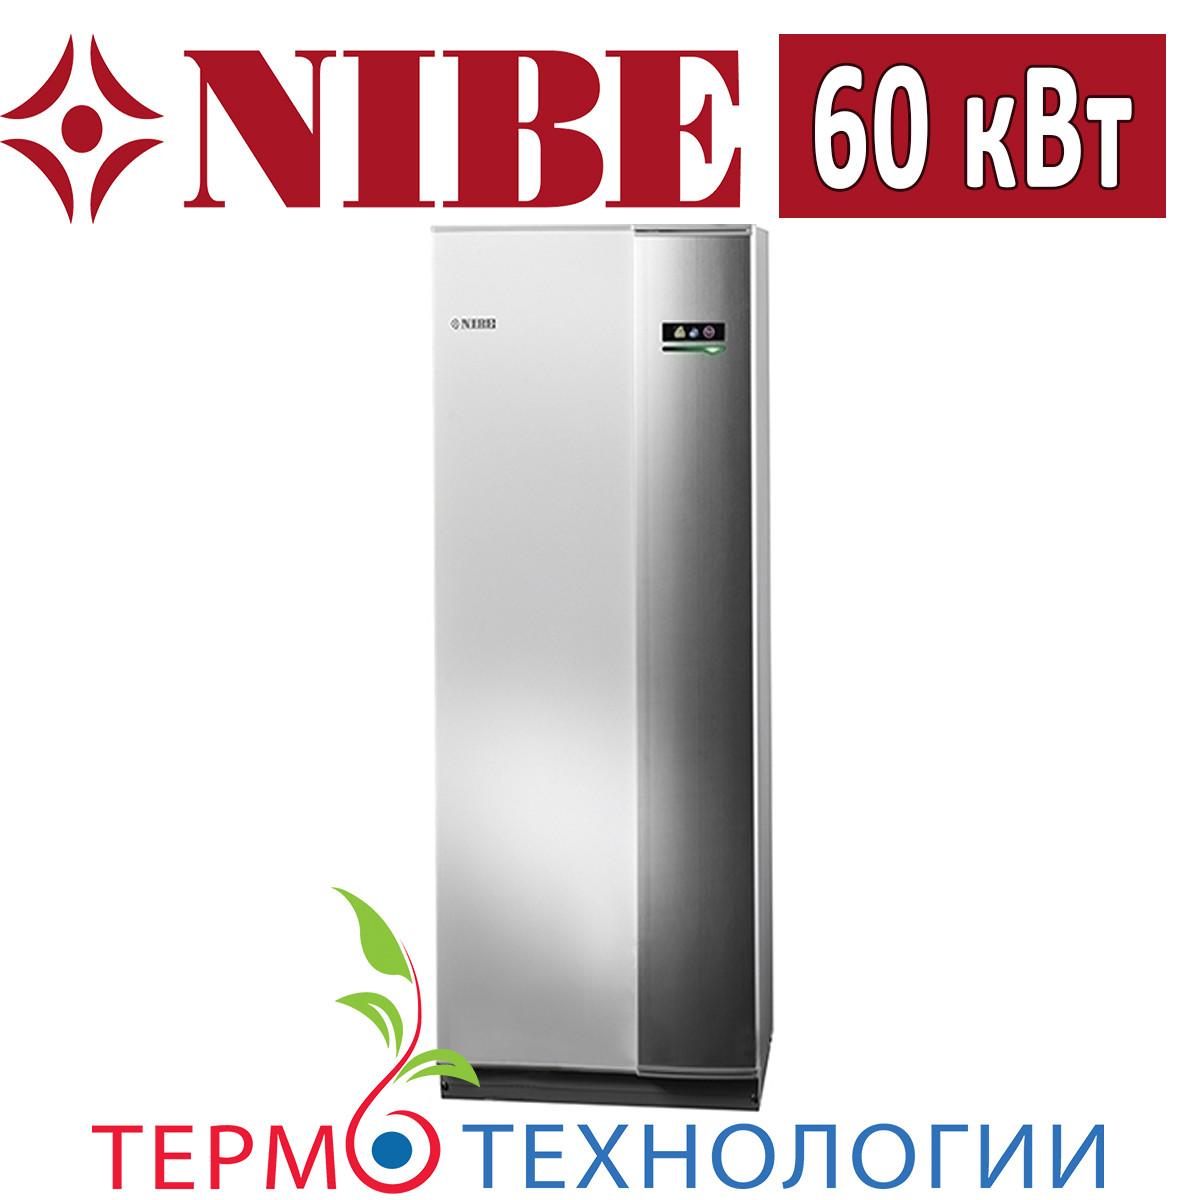 Тепловой насос грунт-вода Nibe  F1345 60 кВт